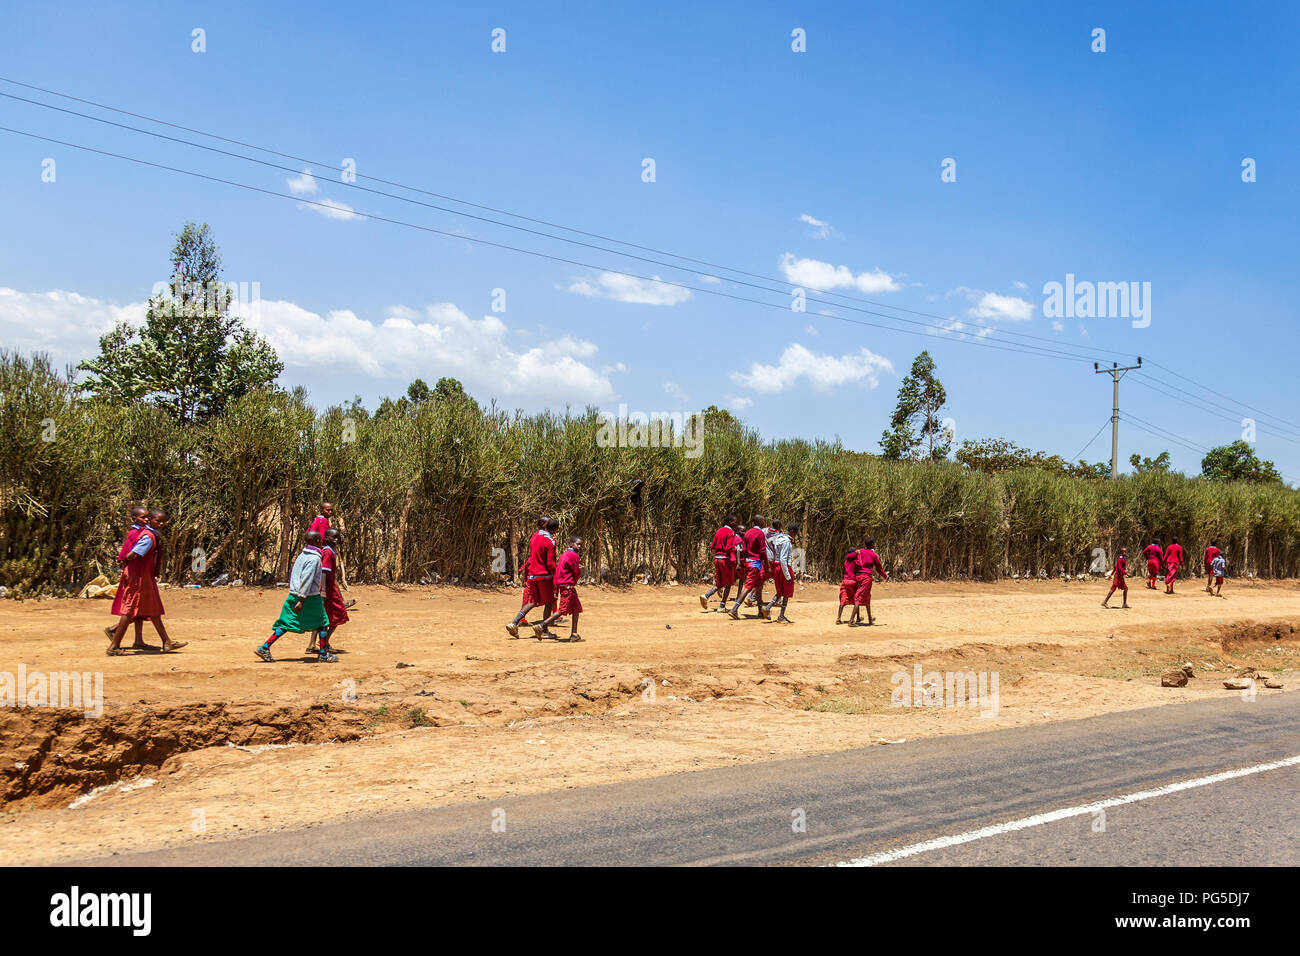 African School children on their way to school - Stock Image